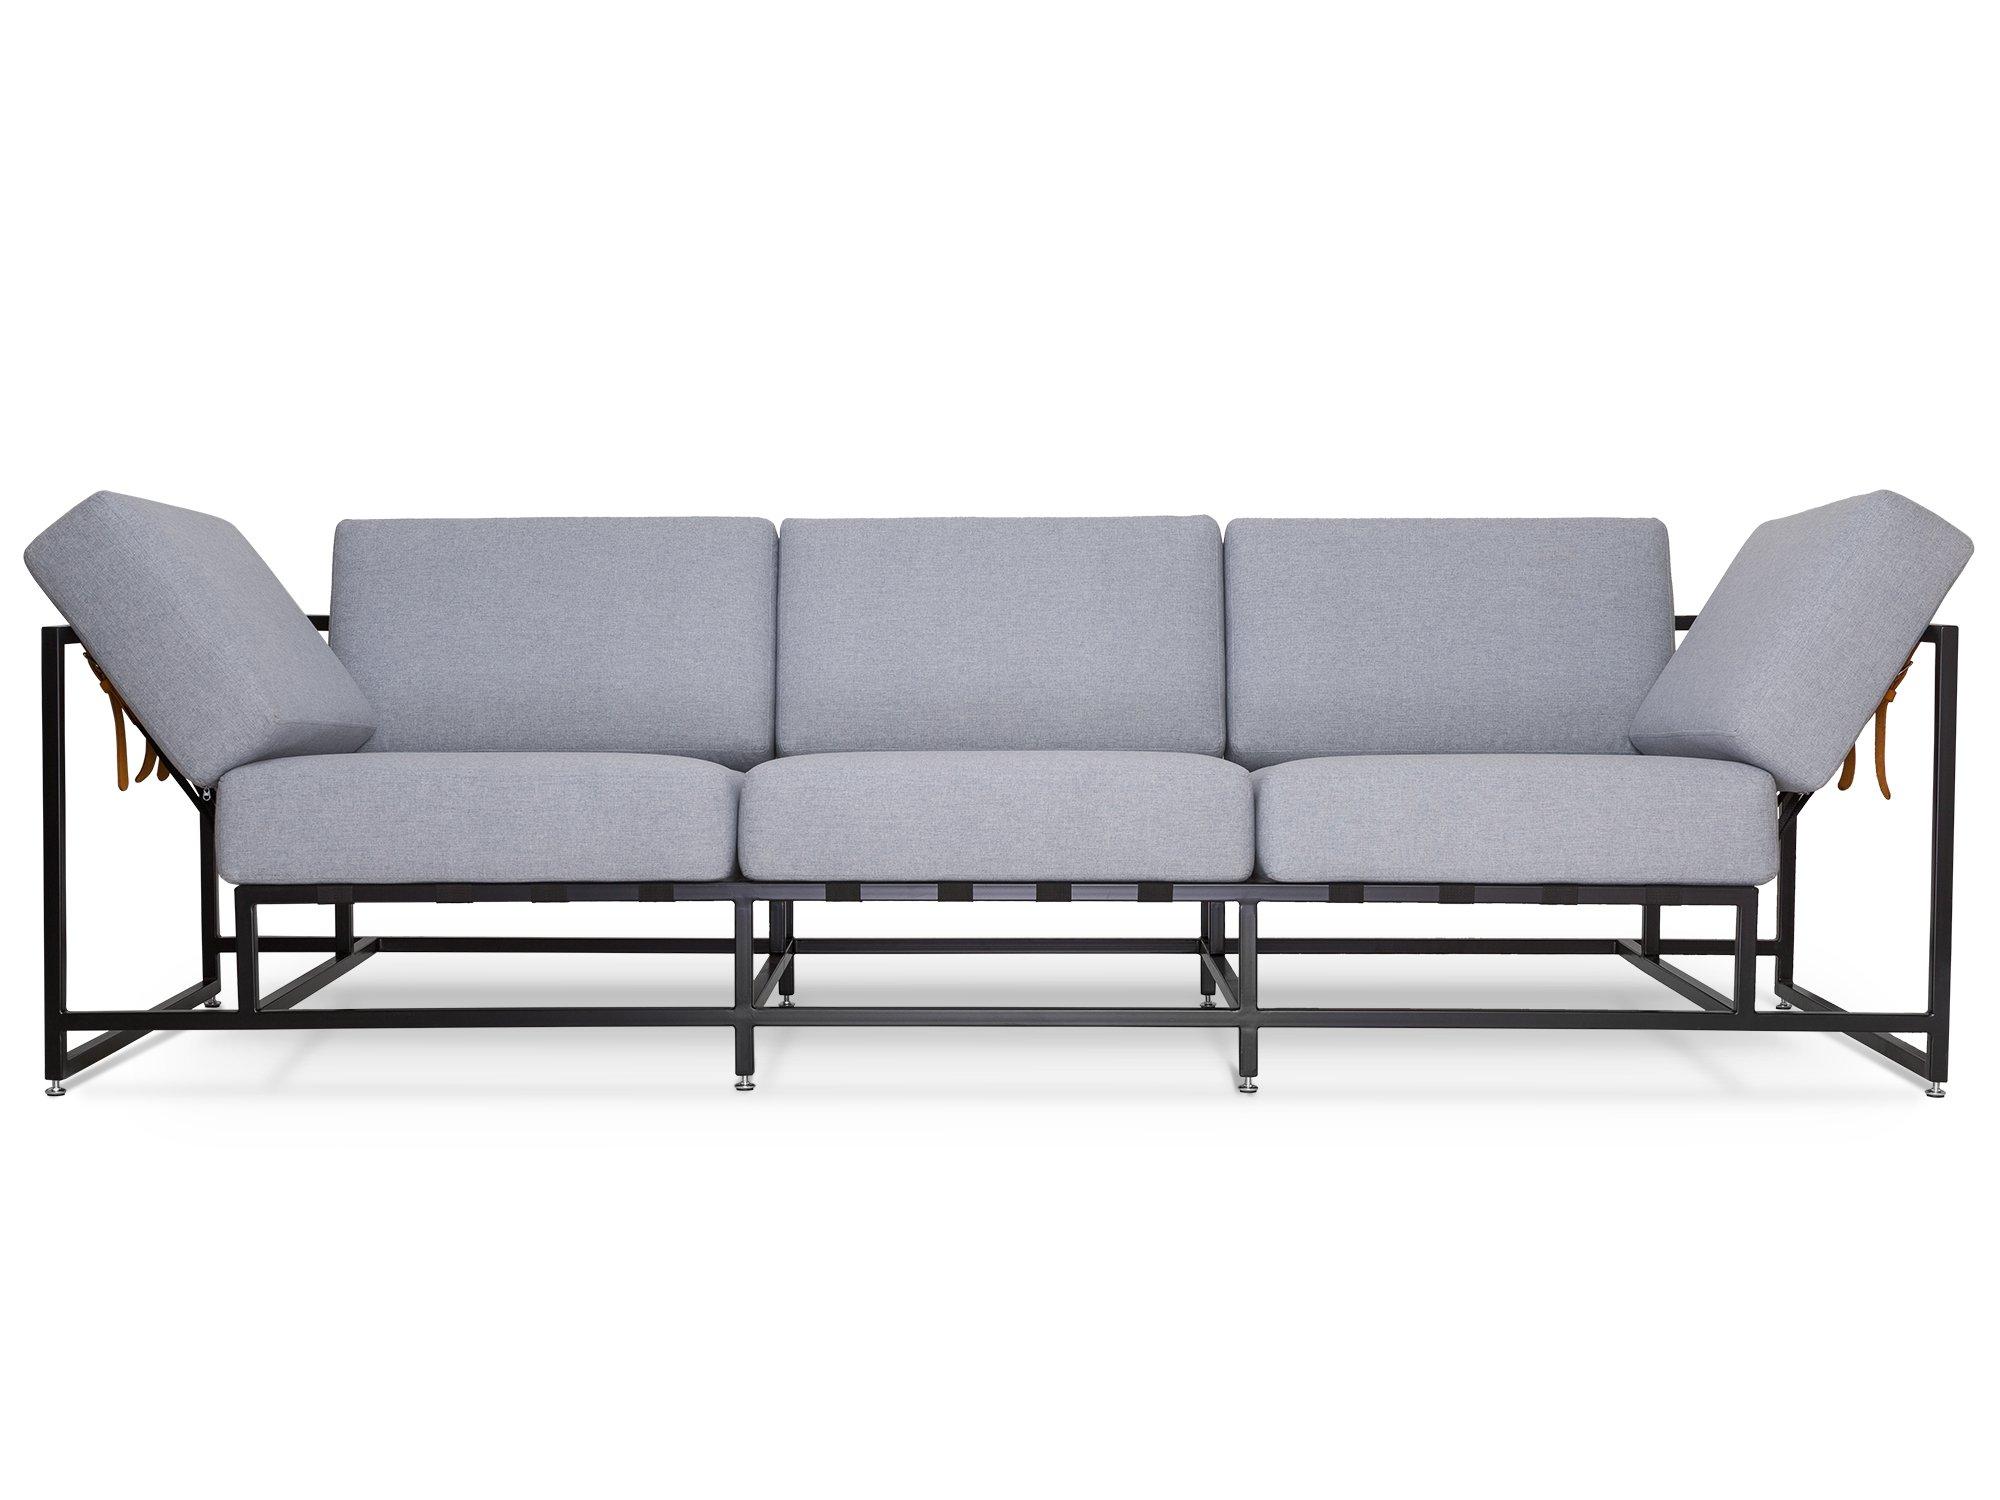 The_sofa трехместный диван комфорт серый 134335/9